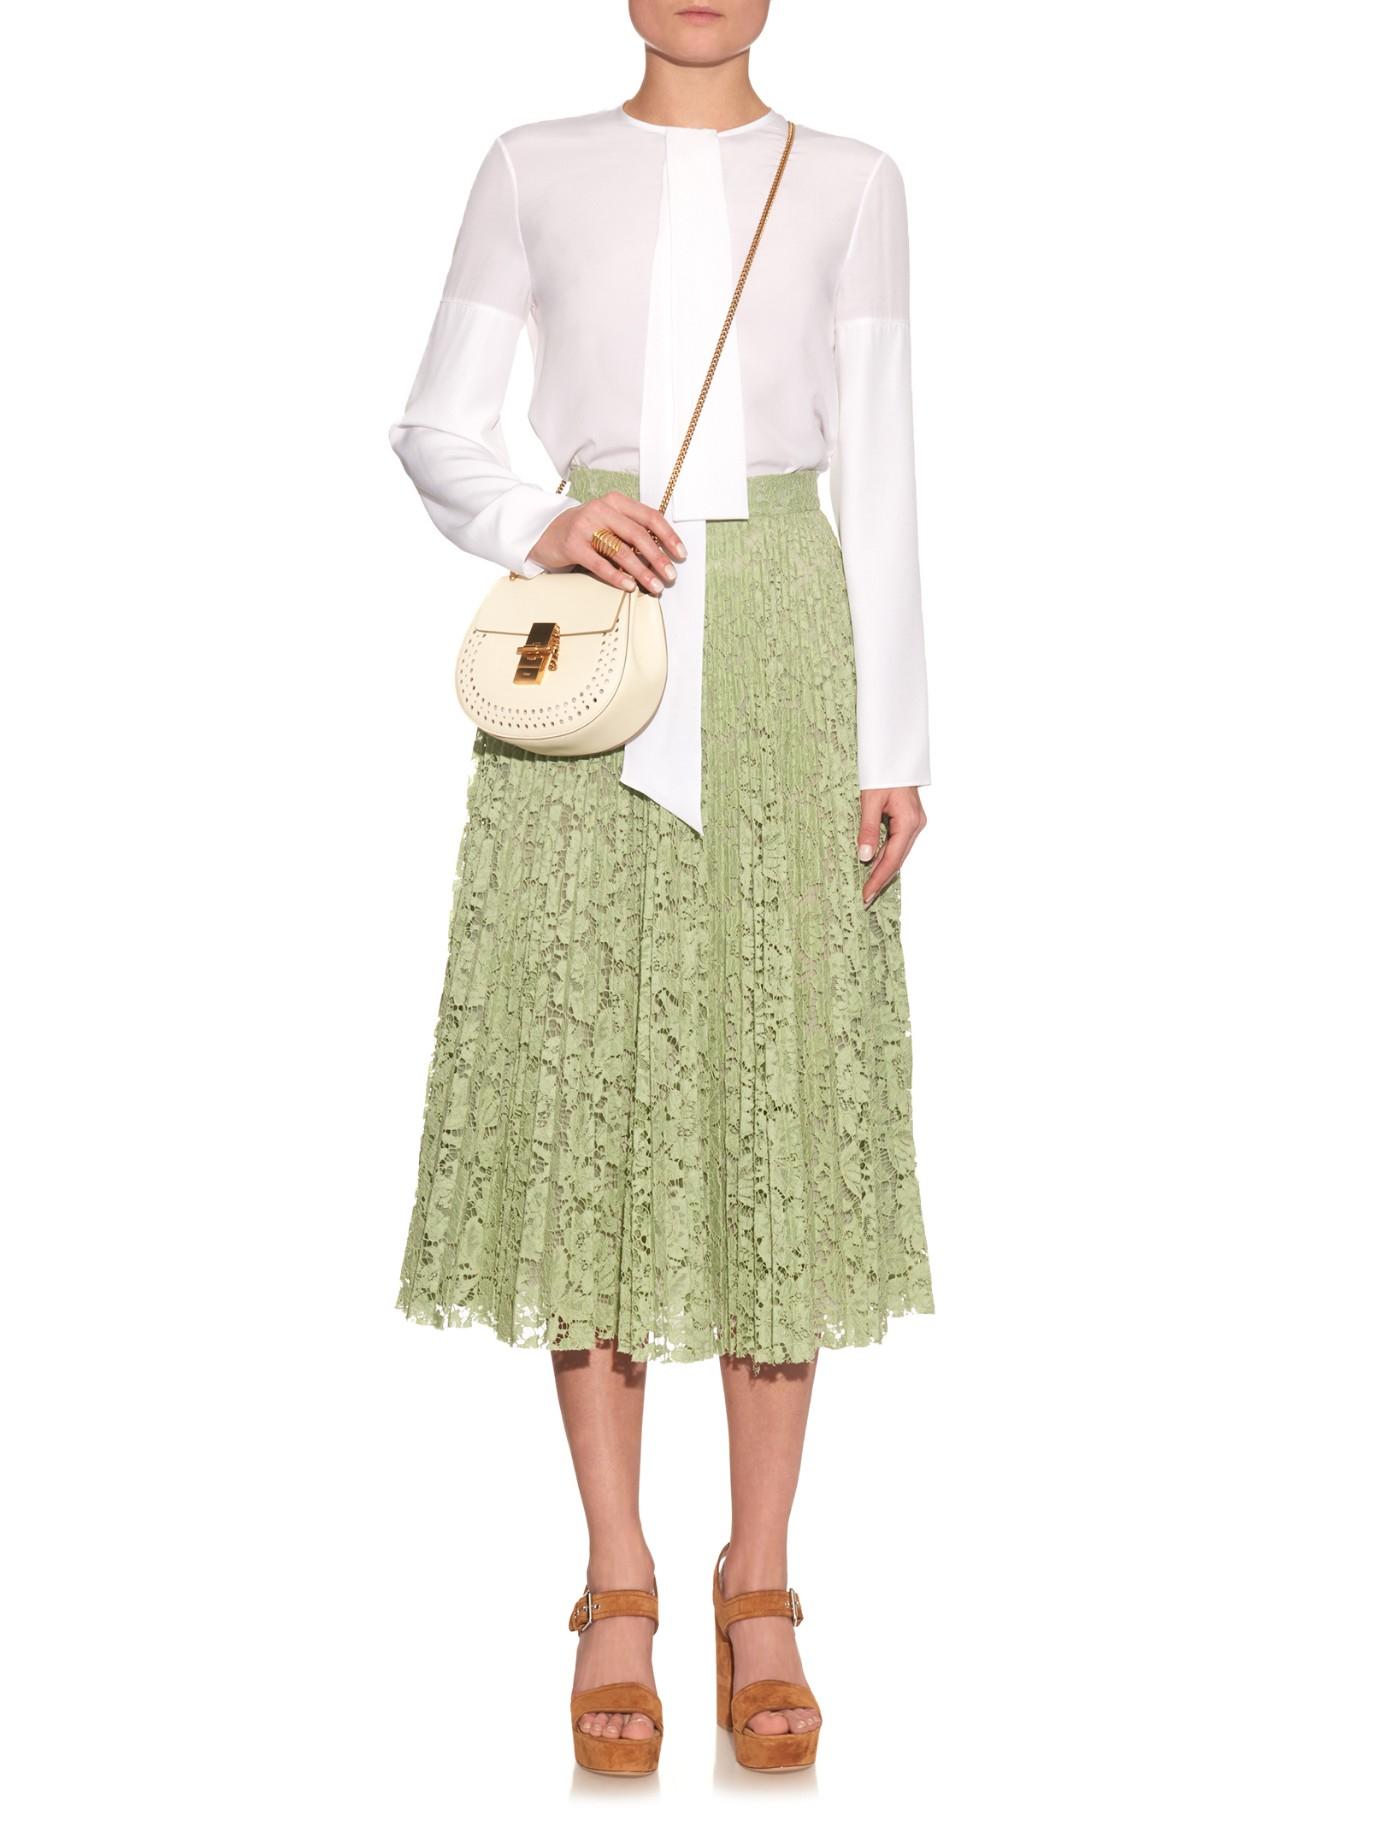 chloe purse - Chlo�� Drew Mini Leather Cross-body Bag in White | Lyst